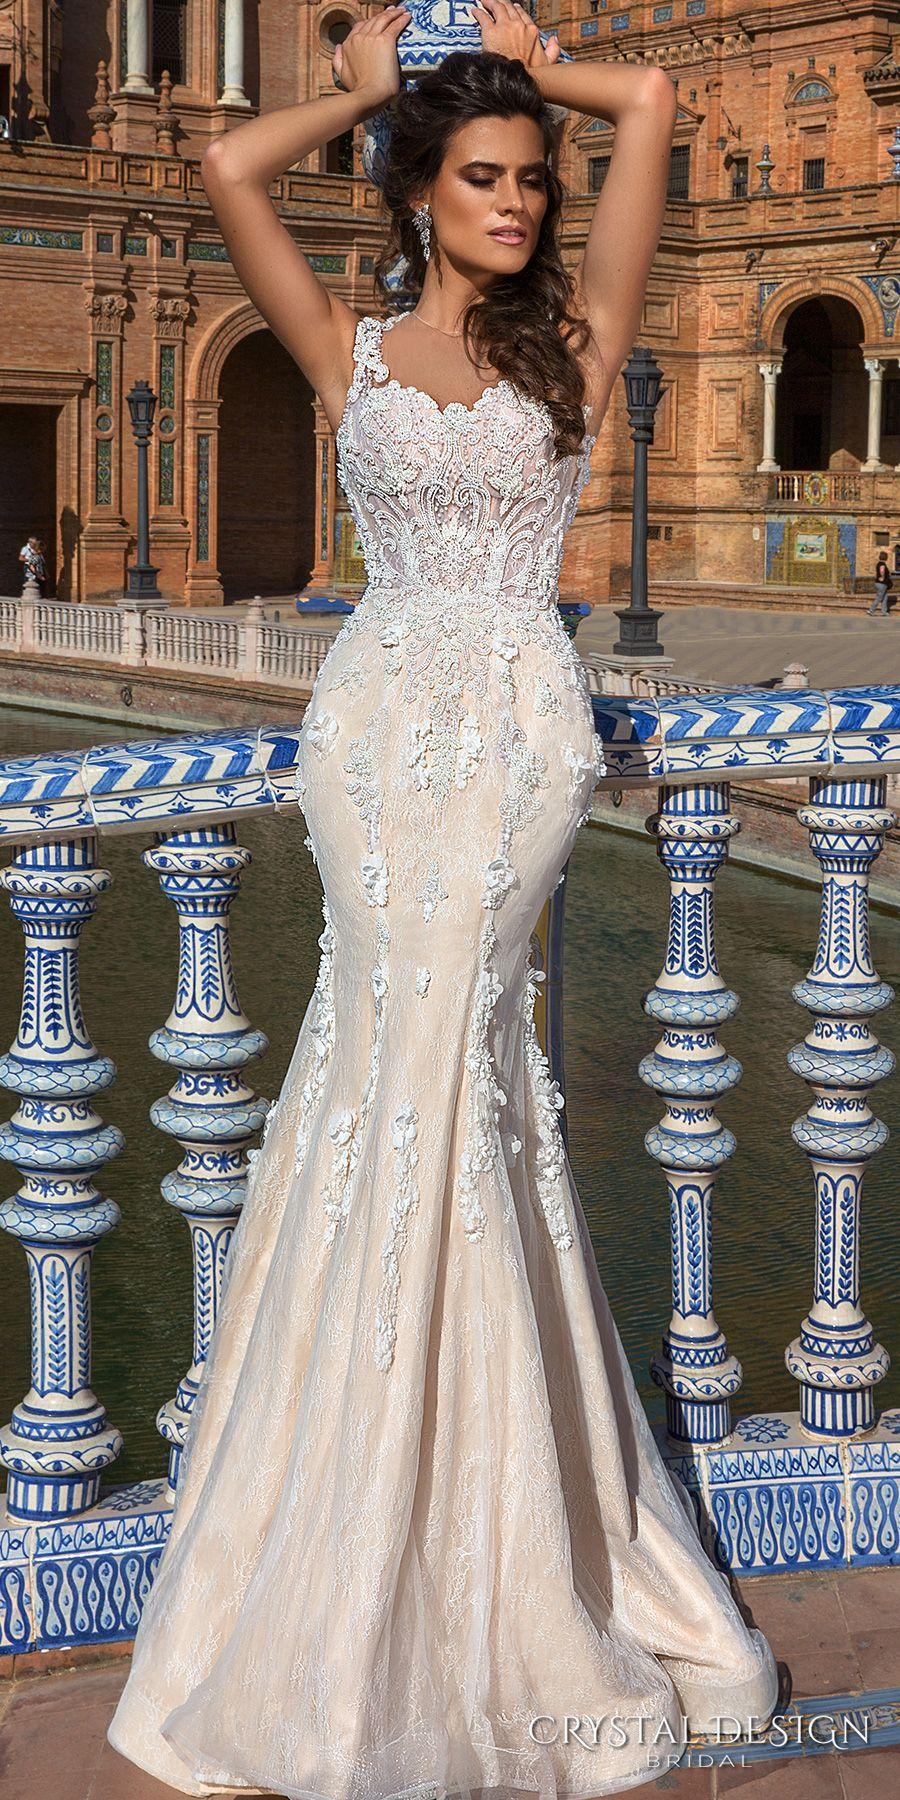 Jovani Fully beaded Sheer Neckline Mermaid Dress 50220